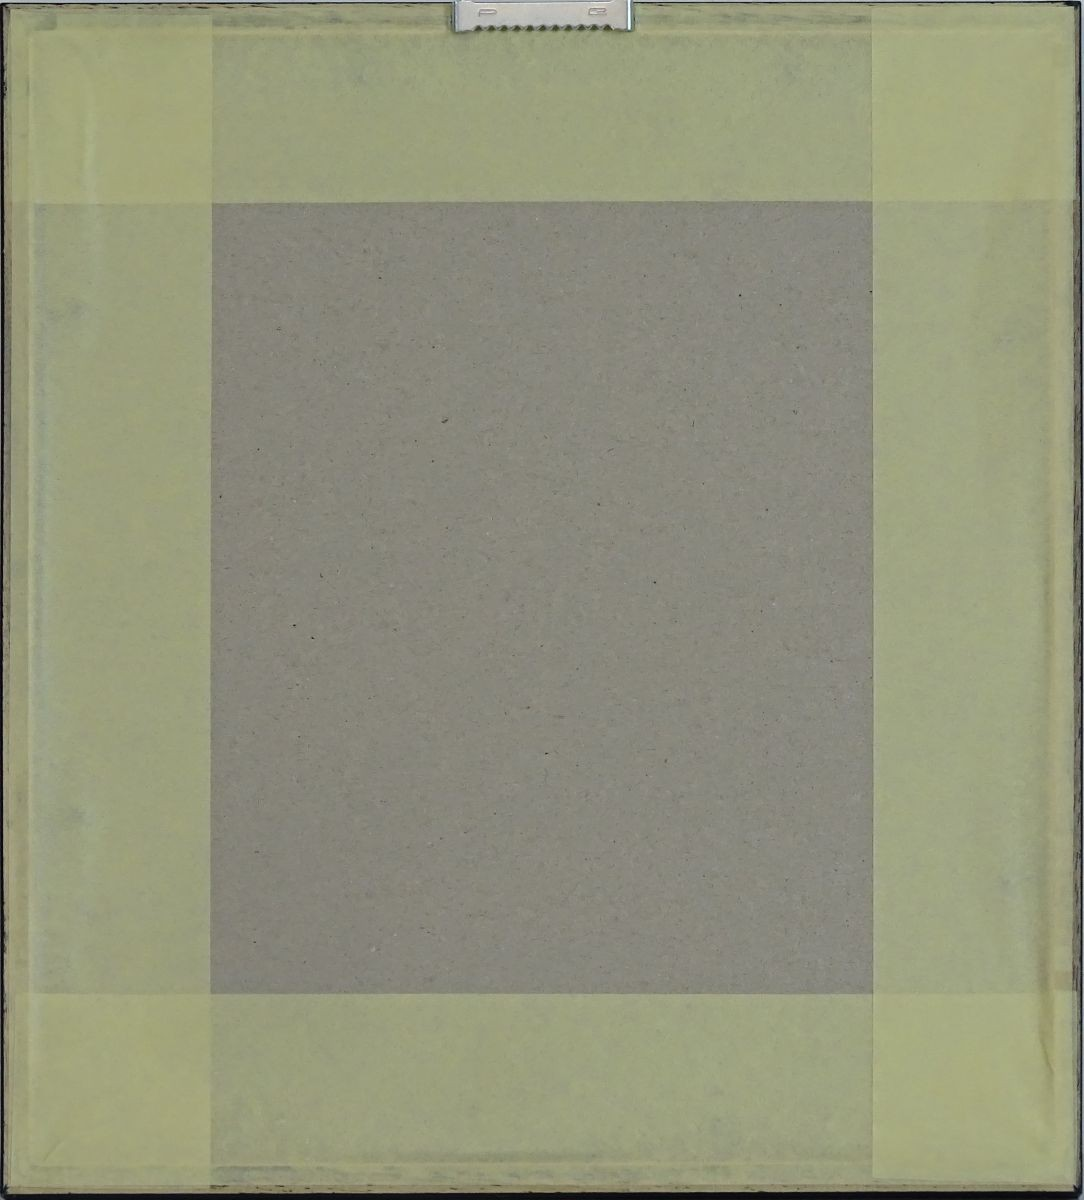 DSC06693.JPG (1084×1200)